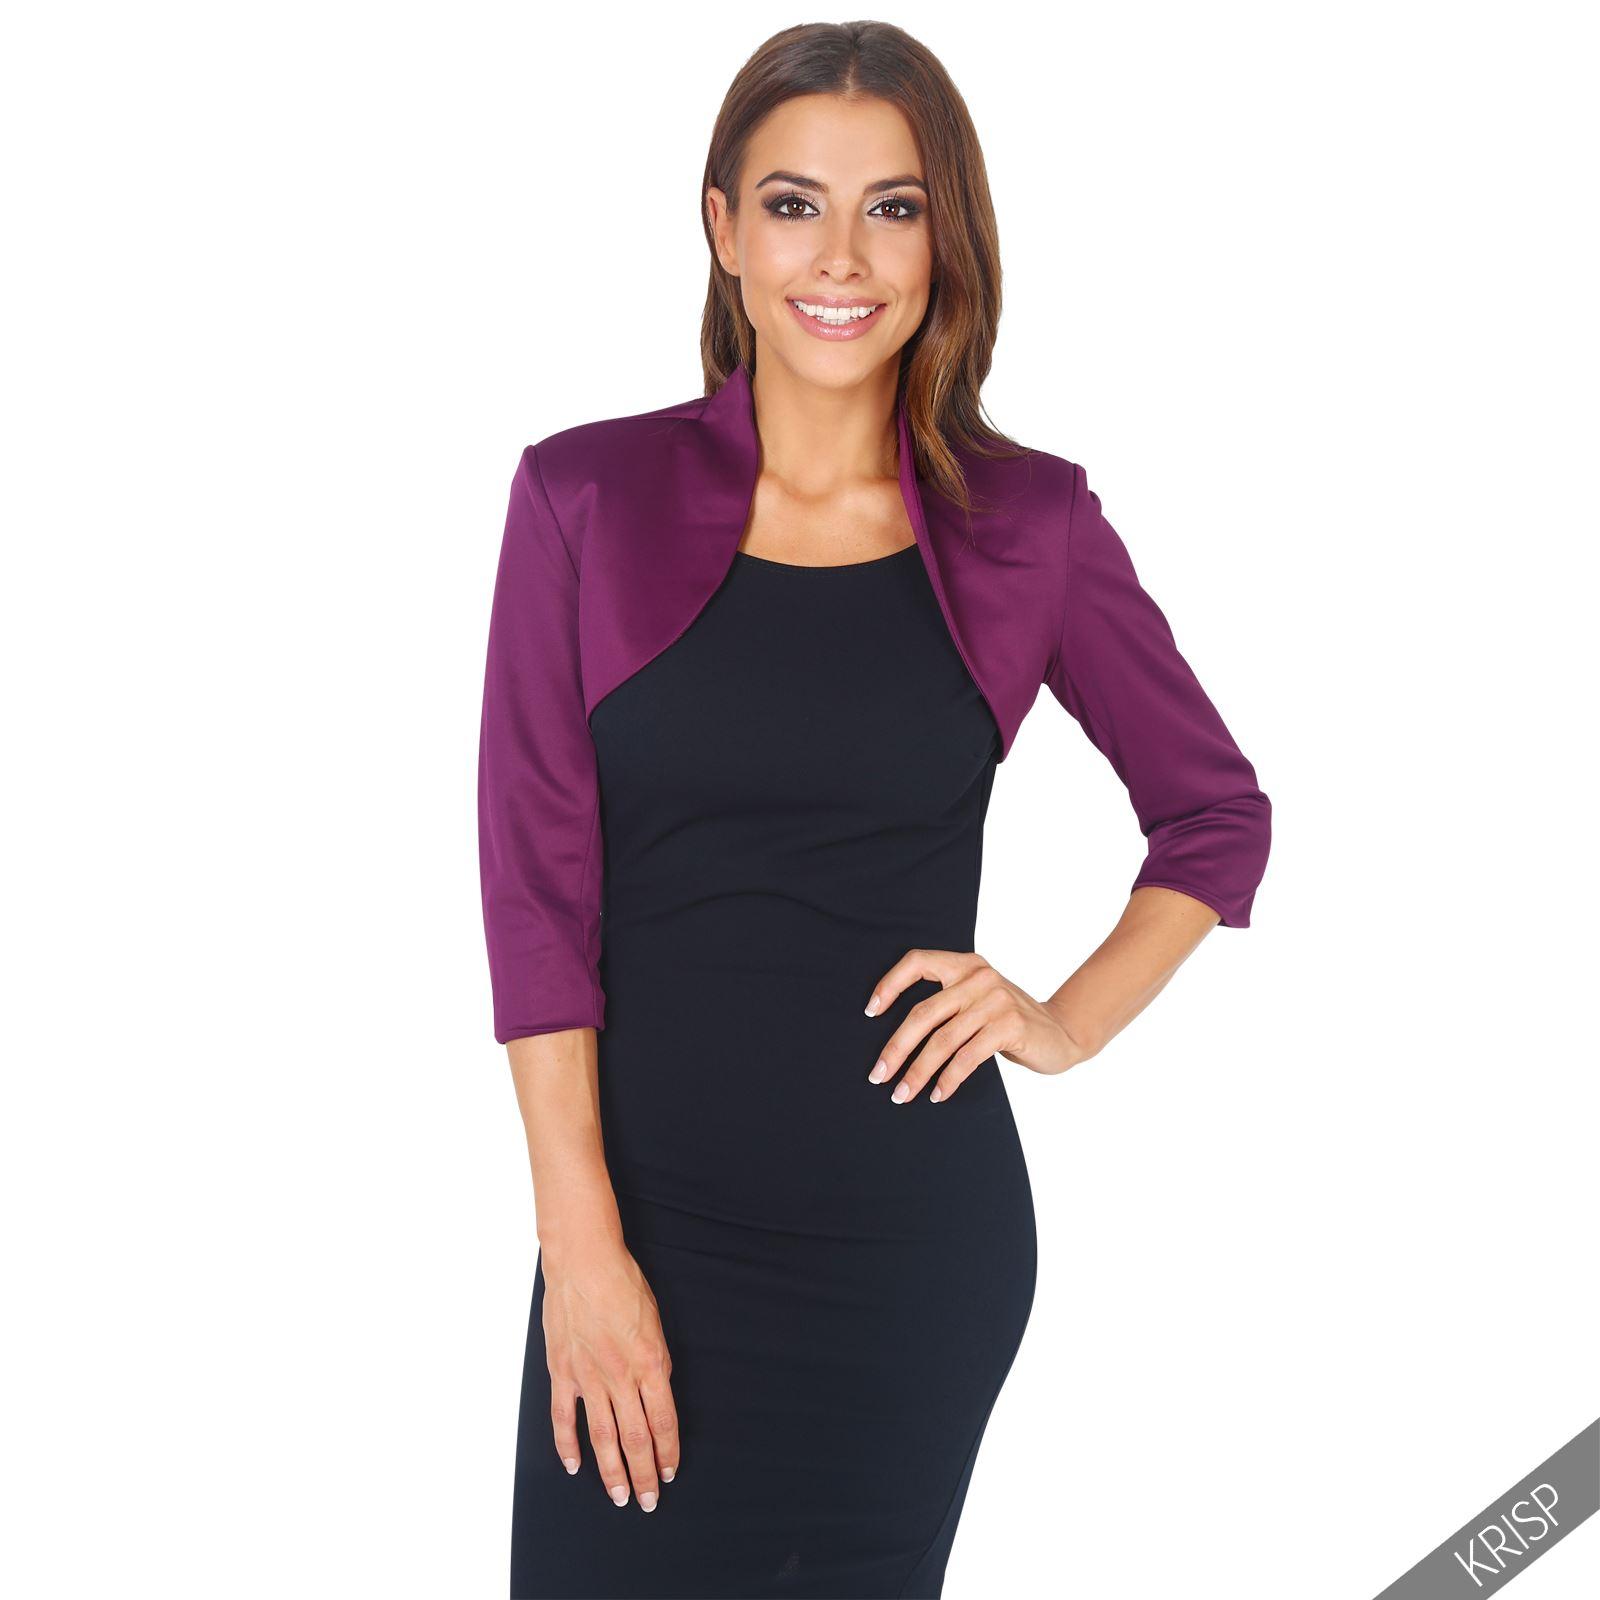 Womens-Tailored-Bolero-Shrug-Cropped-Top-Short-Sleeve-Party-Blazer-Jacket-Coat thumbnail 16